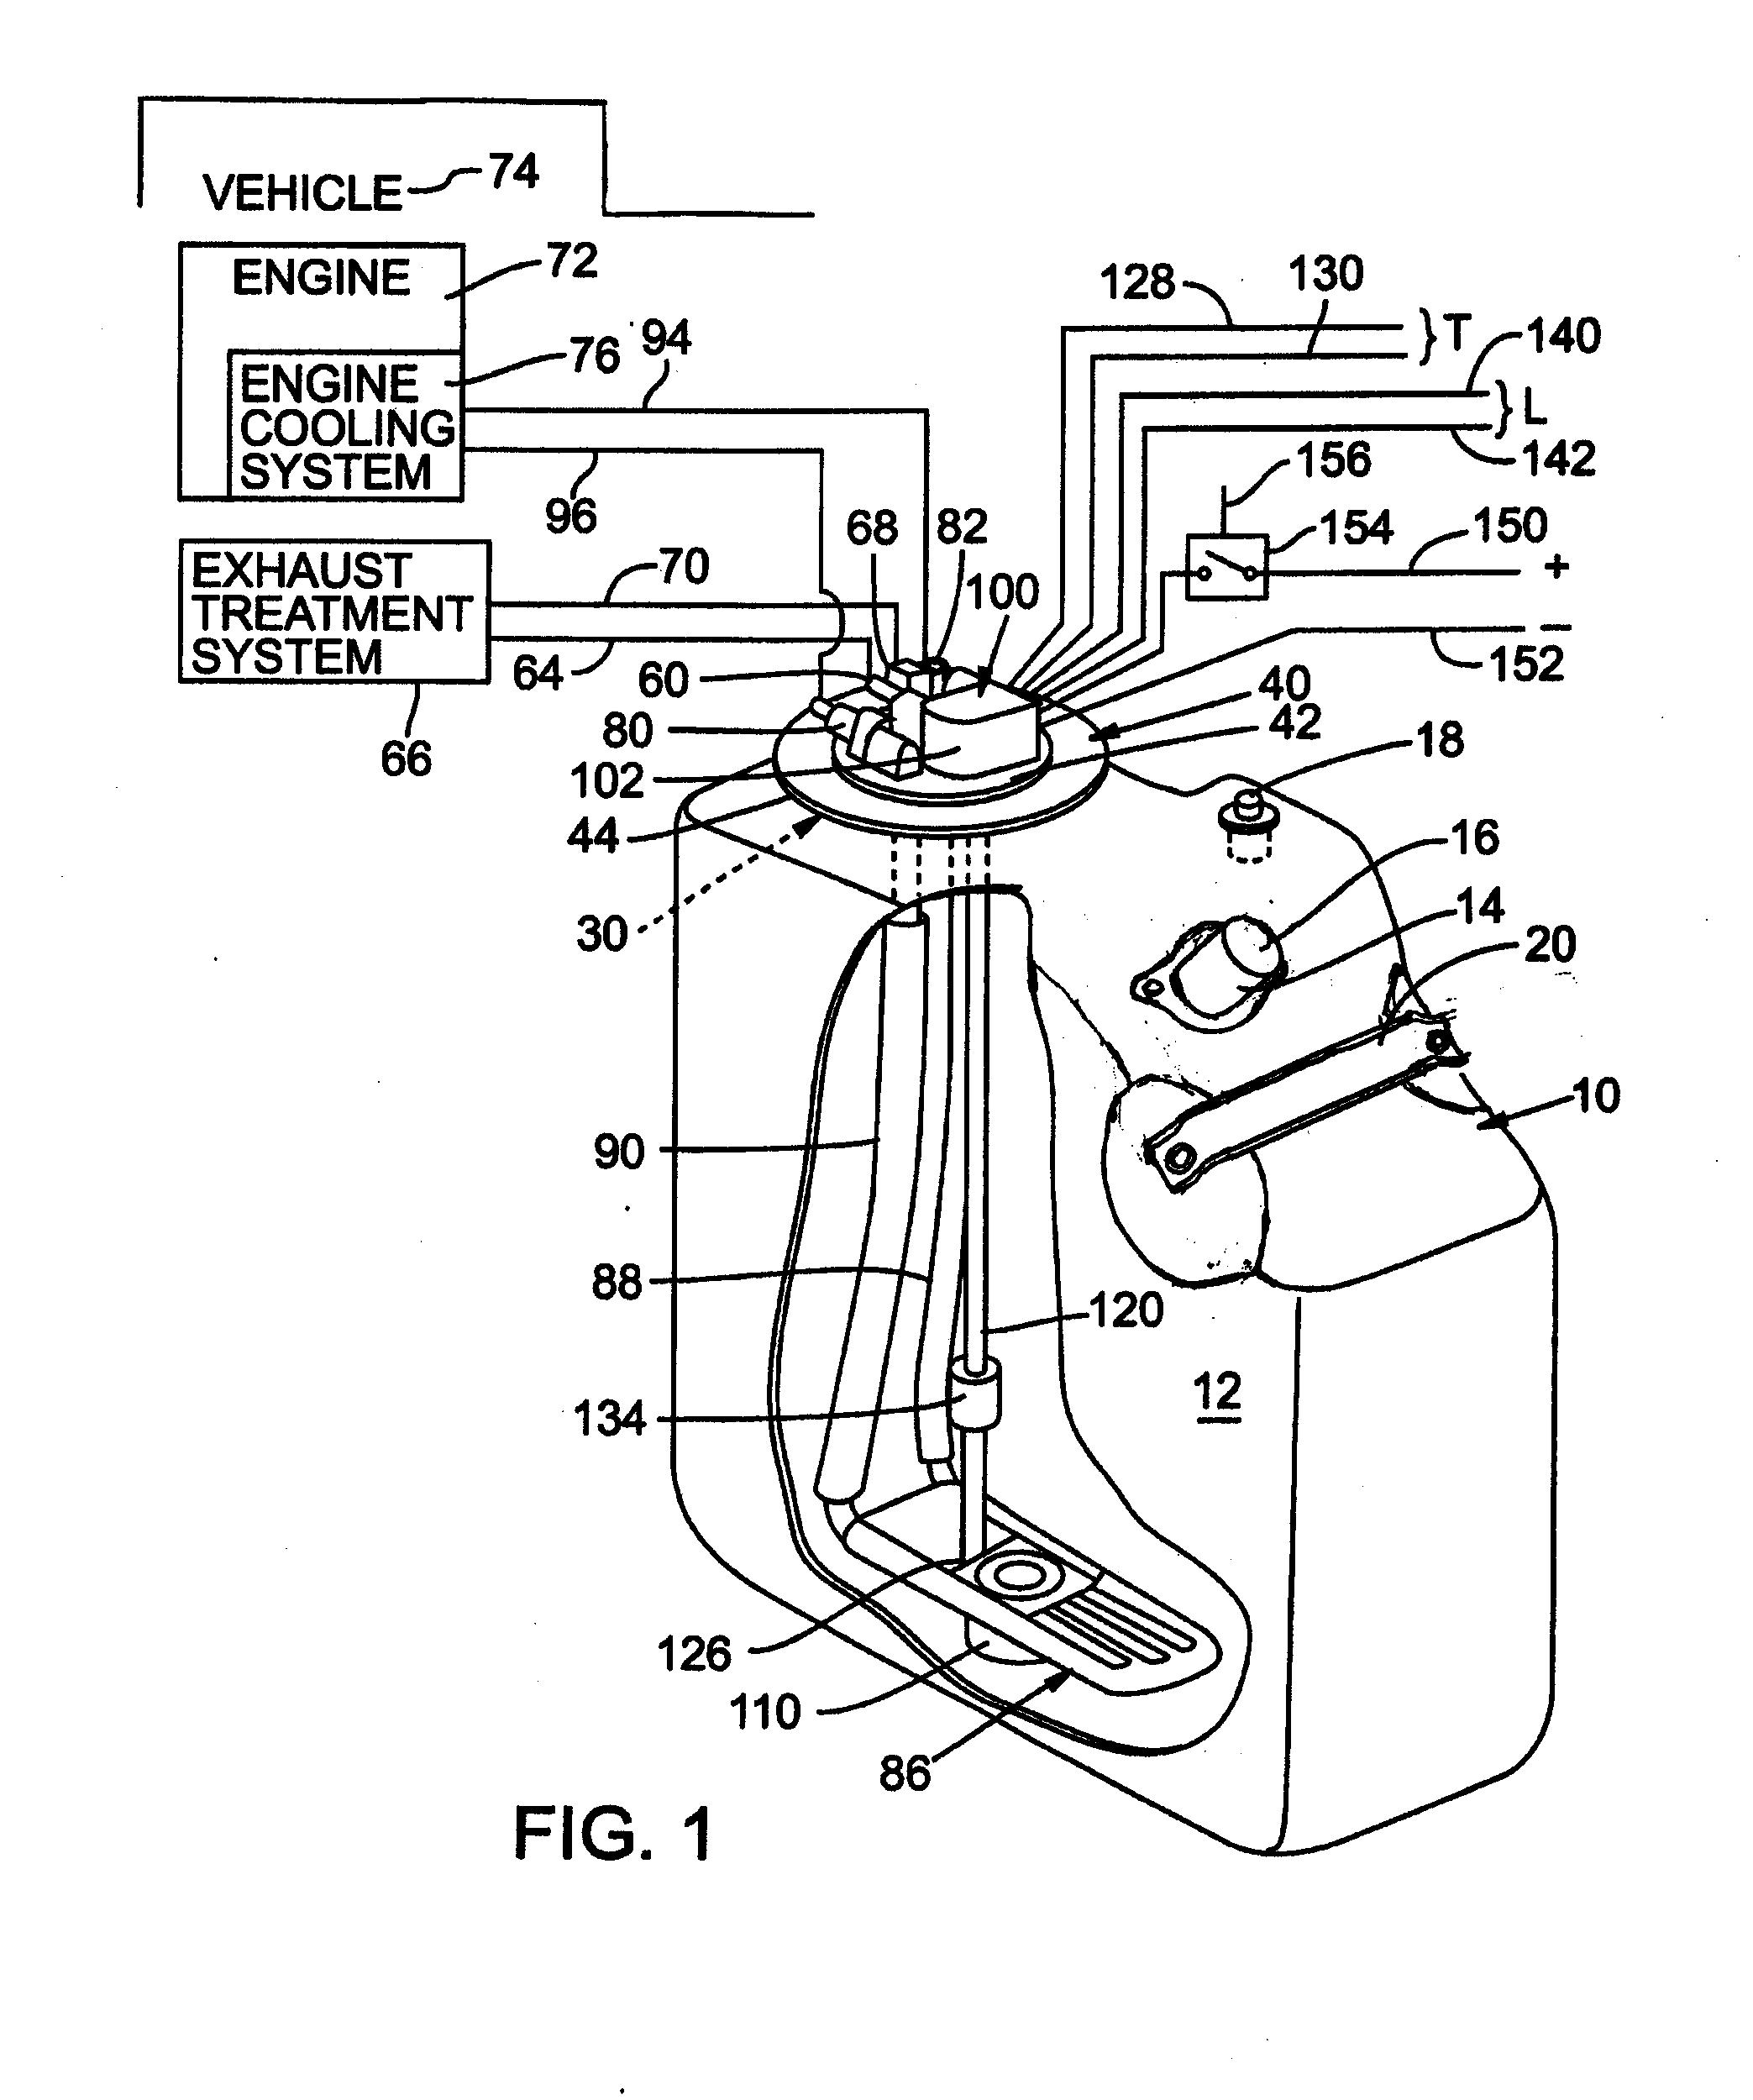 asco 24vdc solenoid valve wiring diagram 2001 saturn sl1 ignition free engine image for